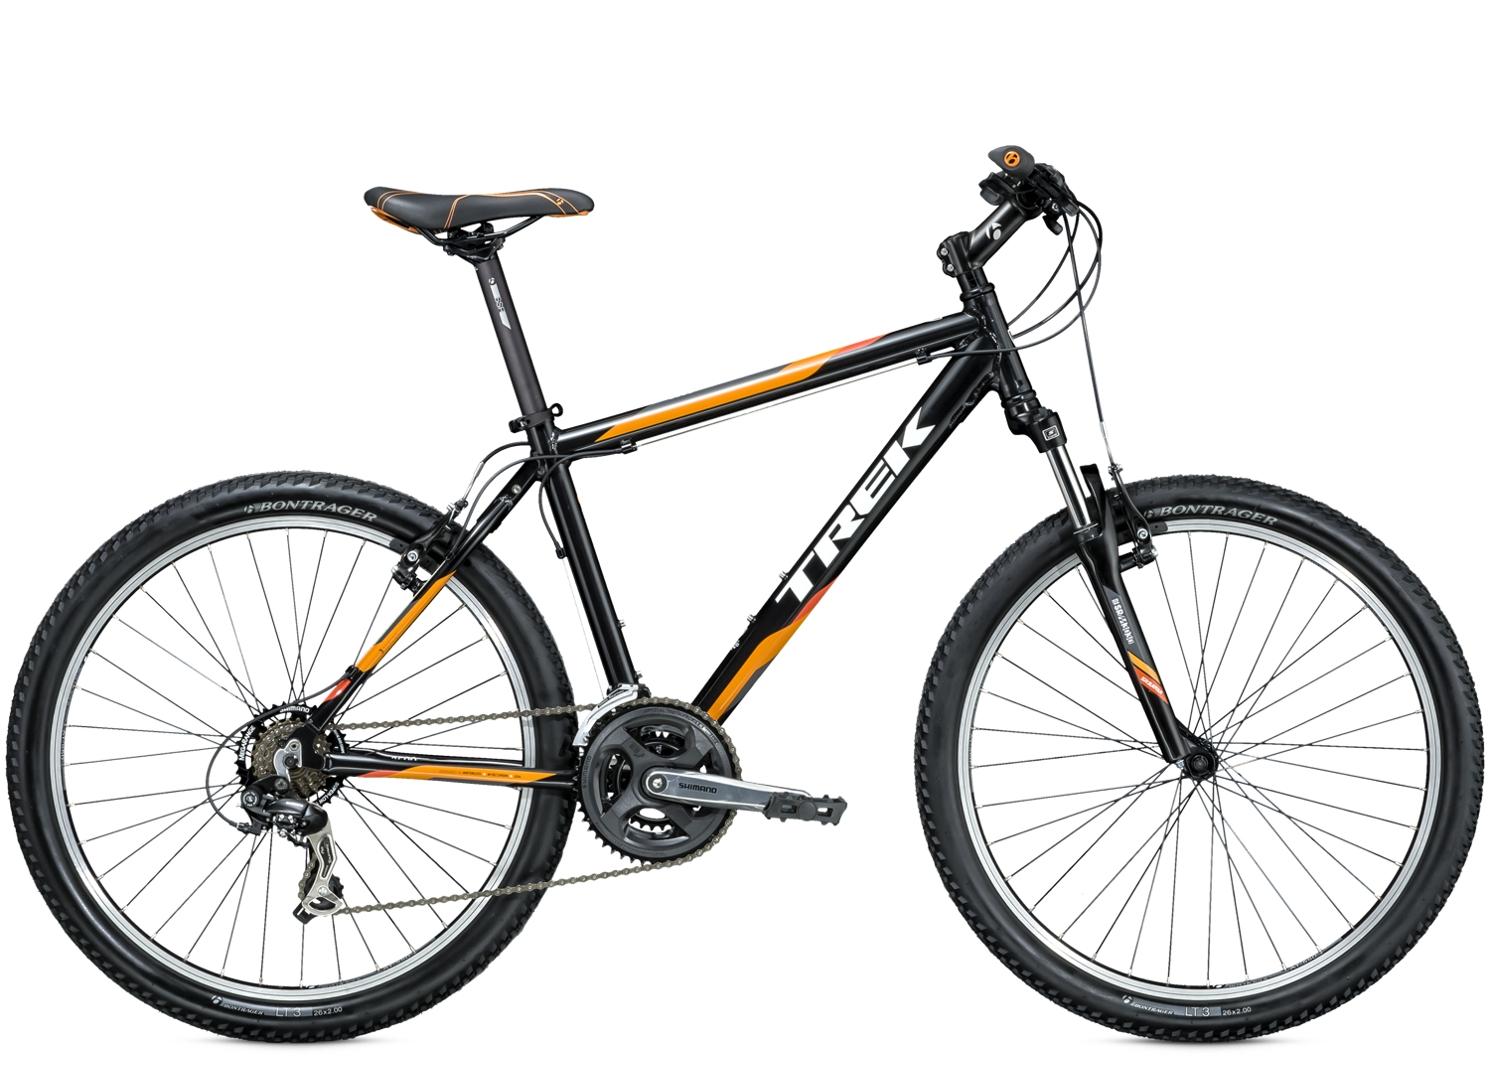 Bicicleta Trek 3500 2016